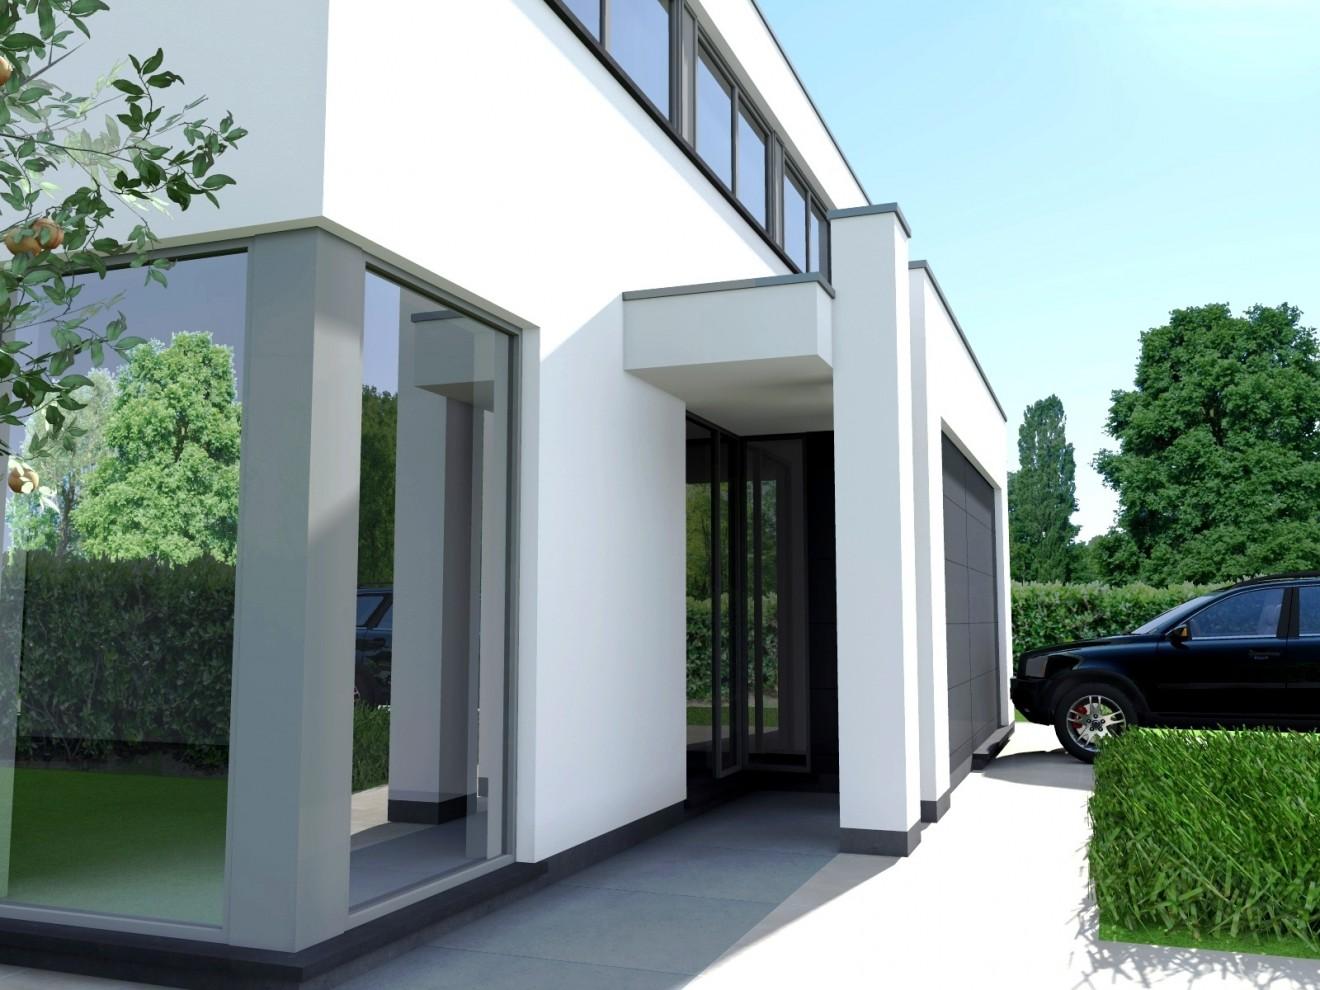 Architect- en ingenieursbureau Andries & Vuylsteke - Nieuwbouwwoning Destelbergen